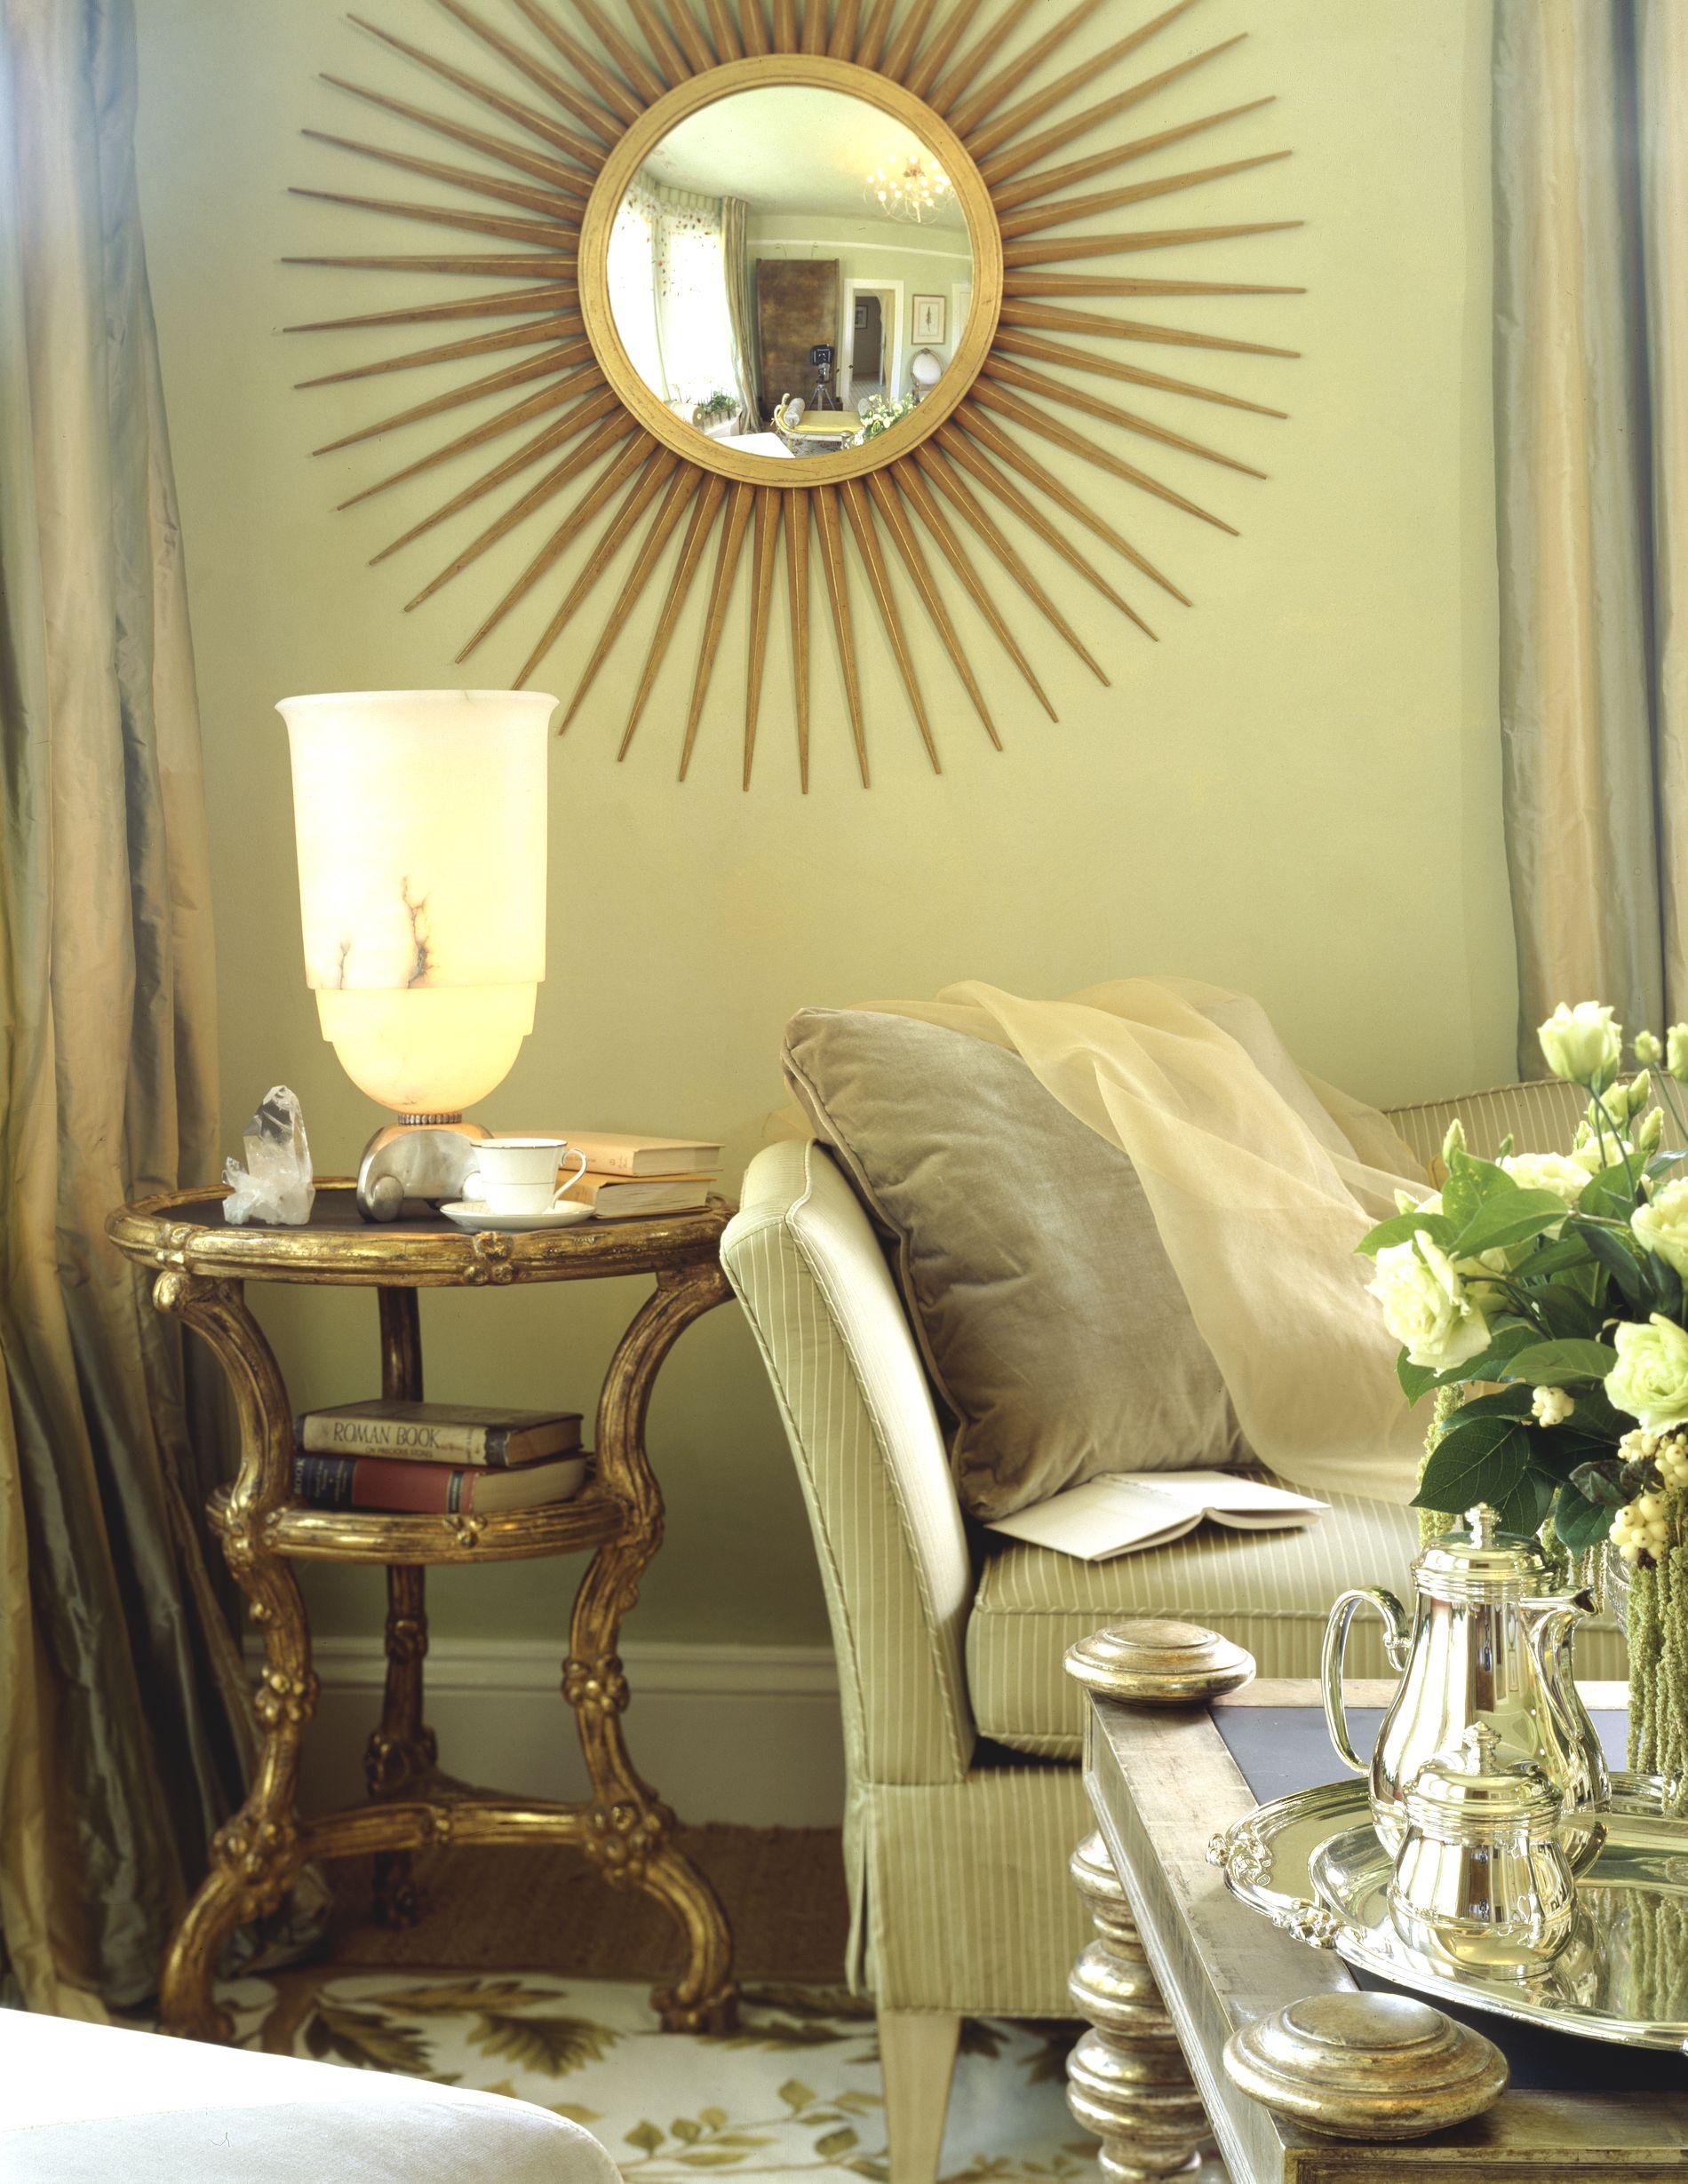 Showcase Green Room Vignette Stacey Lapuk Interiors Interior Interior Vignette Interior Design